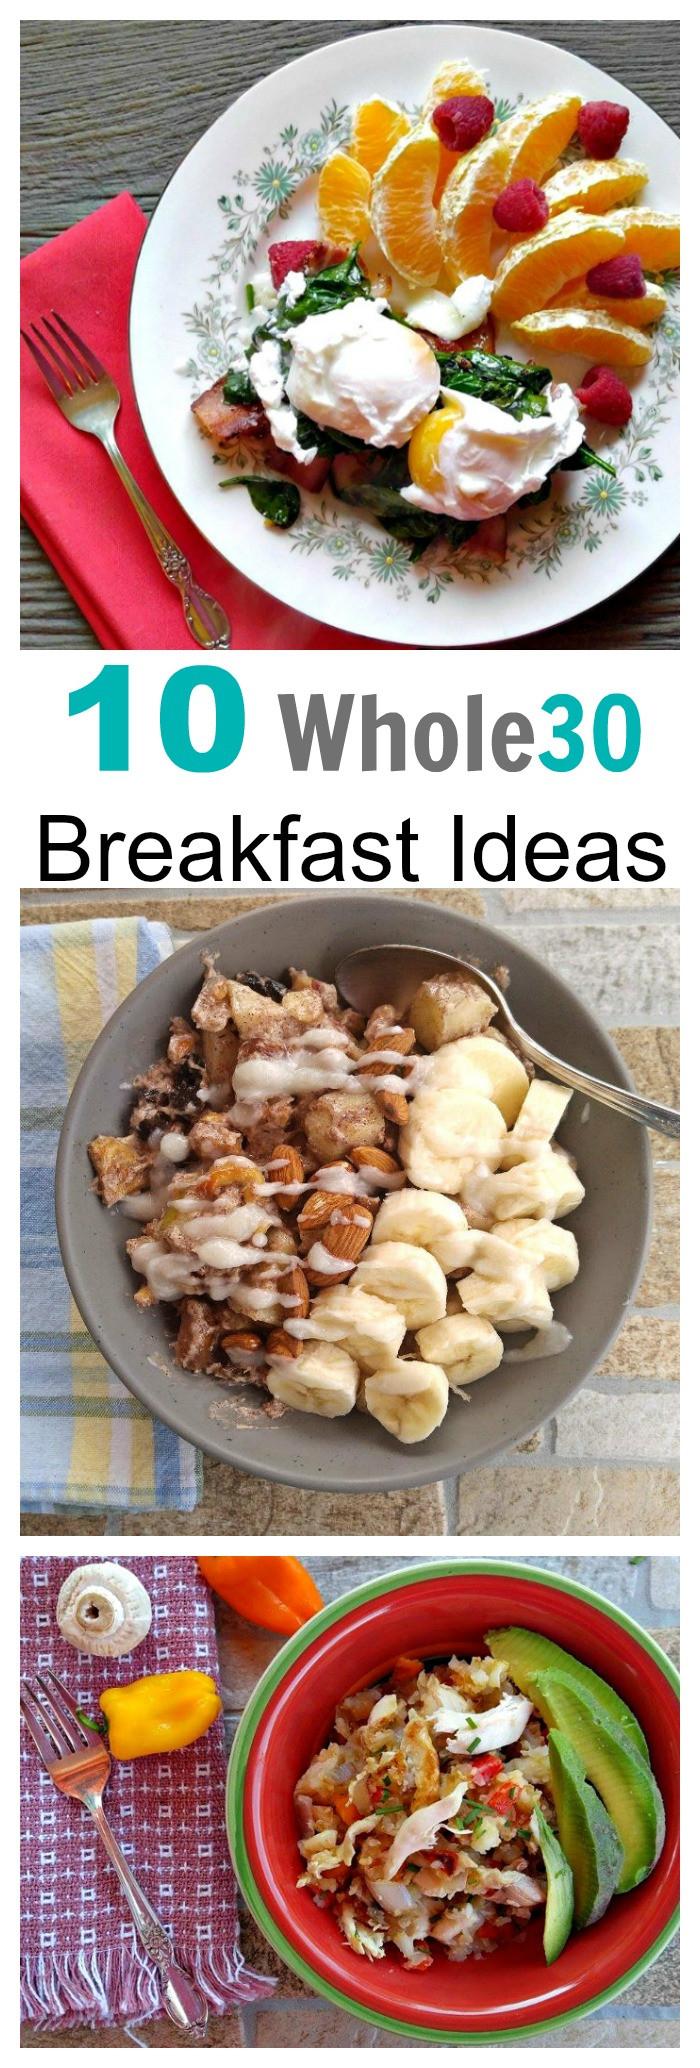 Whole 30 Recipes Breakfast  Whole30 Breakfast Recipes Easy Paleo Ideas to Start your